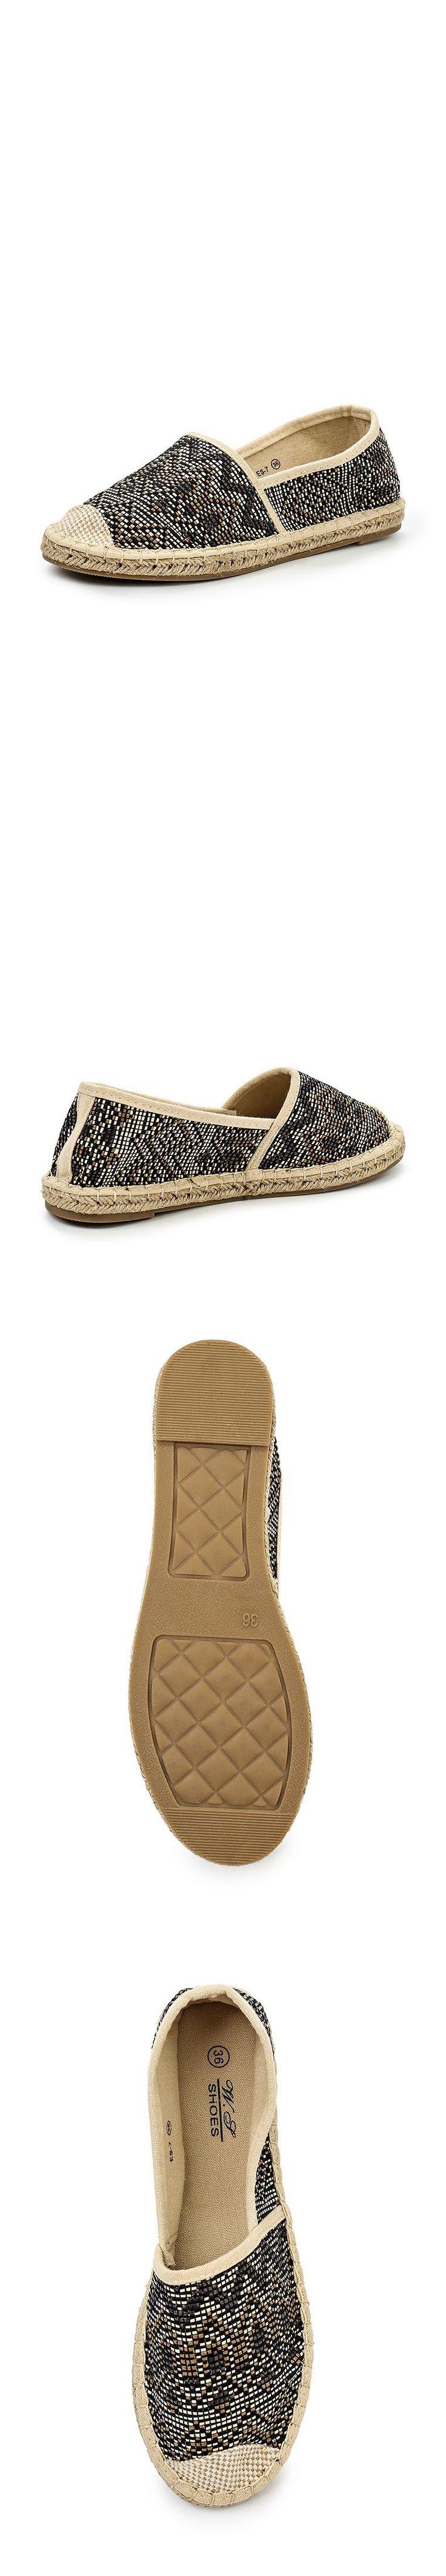 Женская обувь эспадрильи WS Shoes за 1190.00 руб.